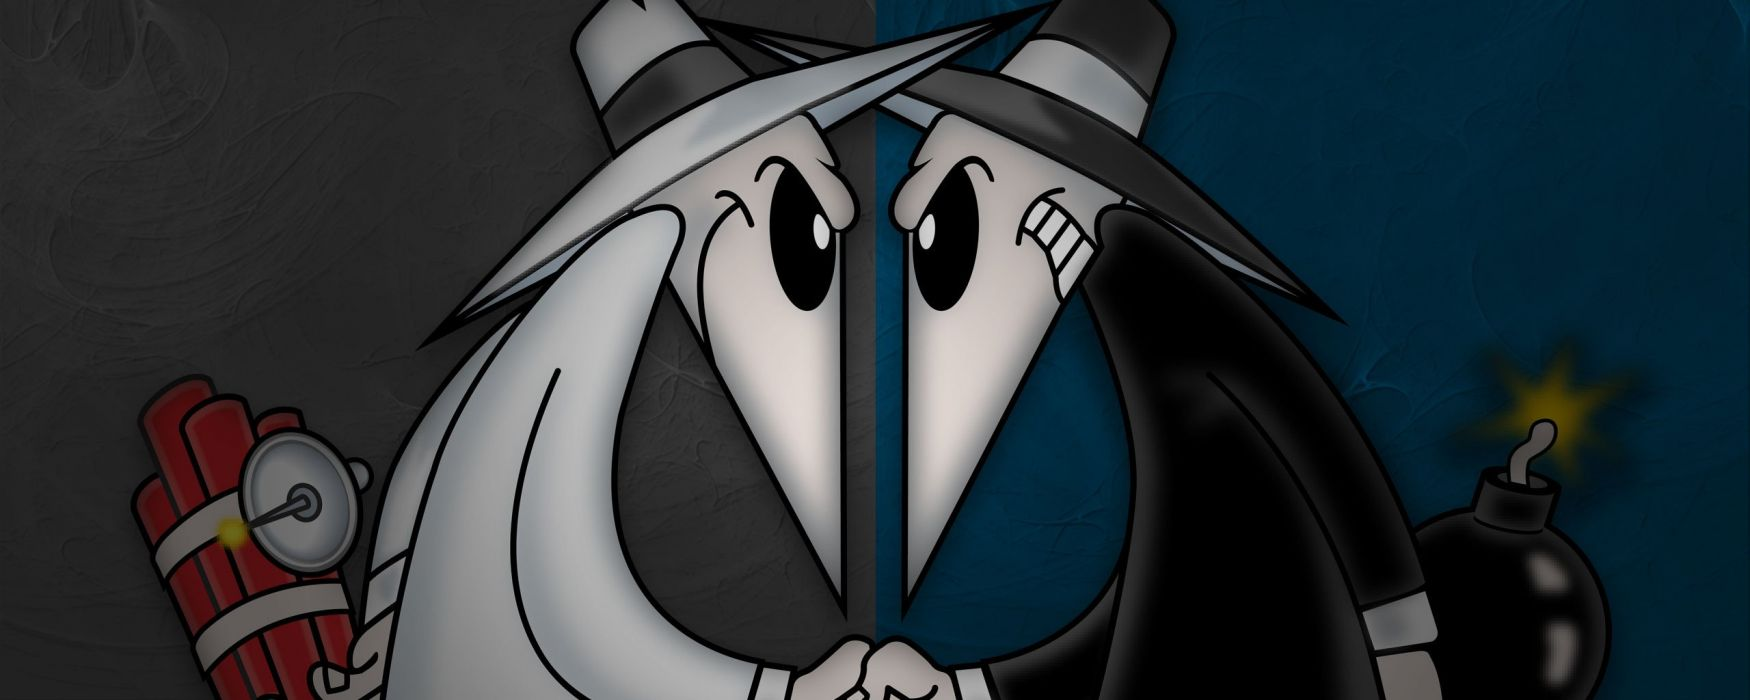 SPY-VS-SPY mad sadic comics crime spy wallpaper